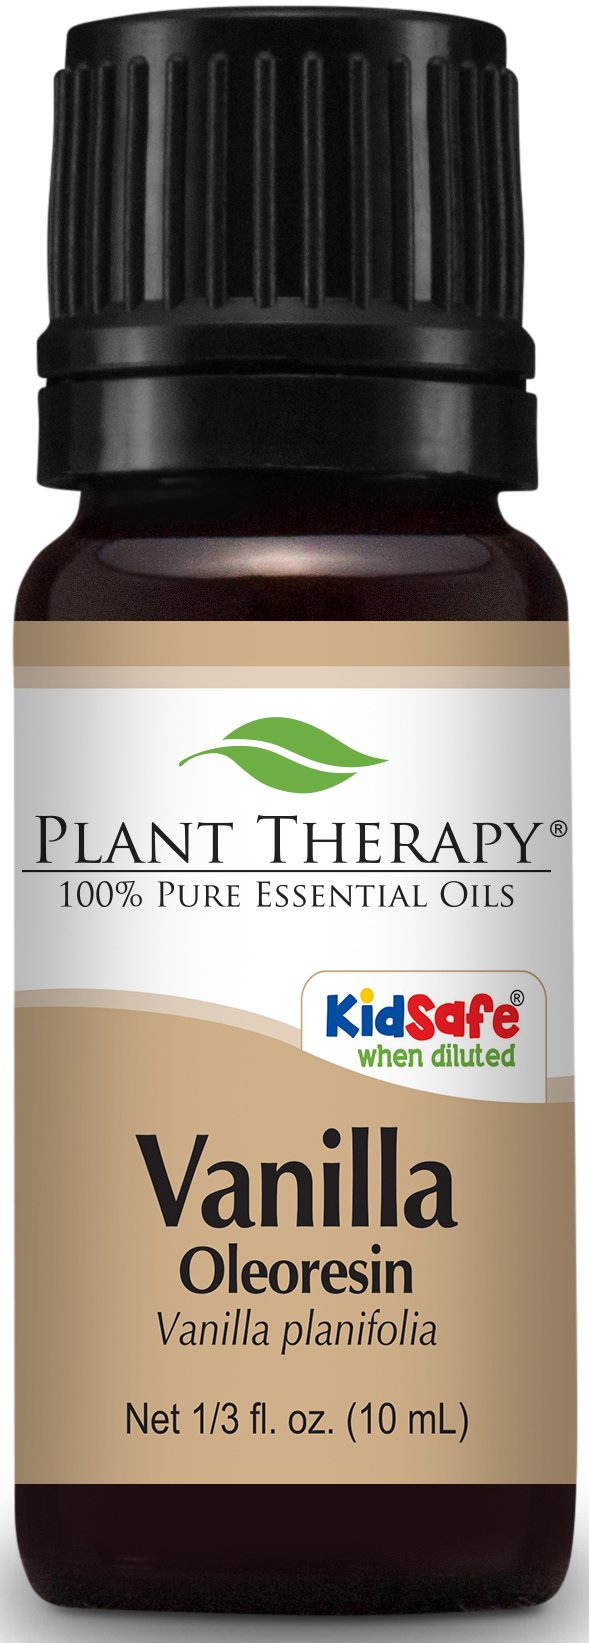 Amazon.com : Plant Therapy Coffee Essential Oil 10 mL (1/3